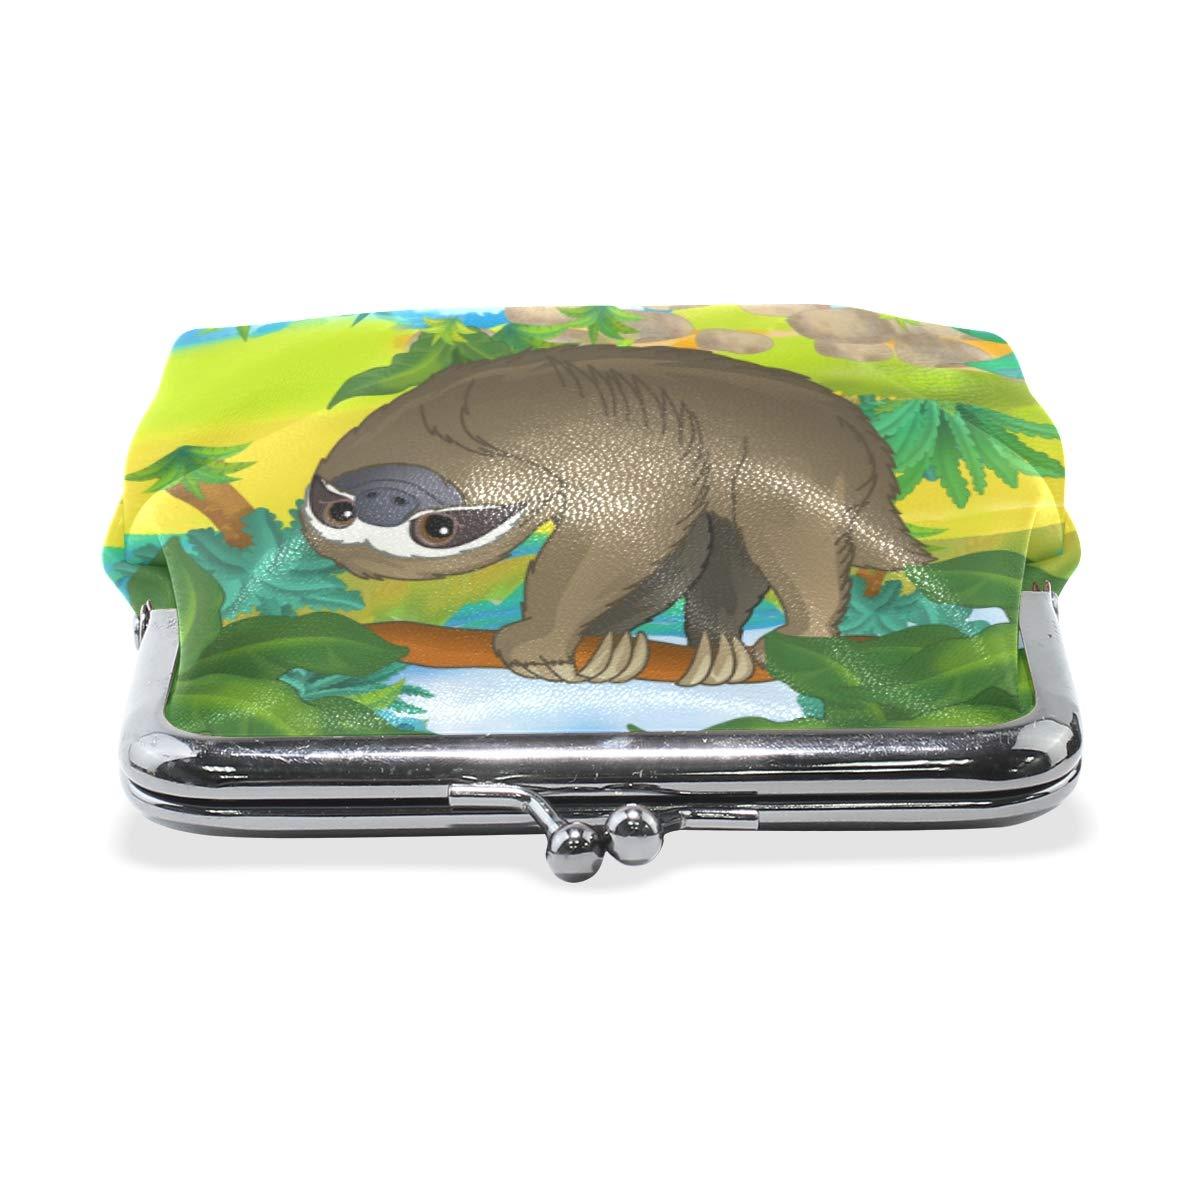 Fashion Womens Coin Purse Cartoon Forest Wild Sloth Vintage Pouch Mini Purse Wallets